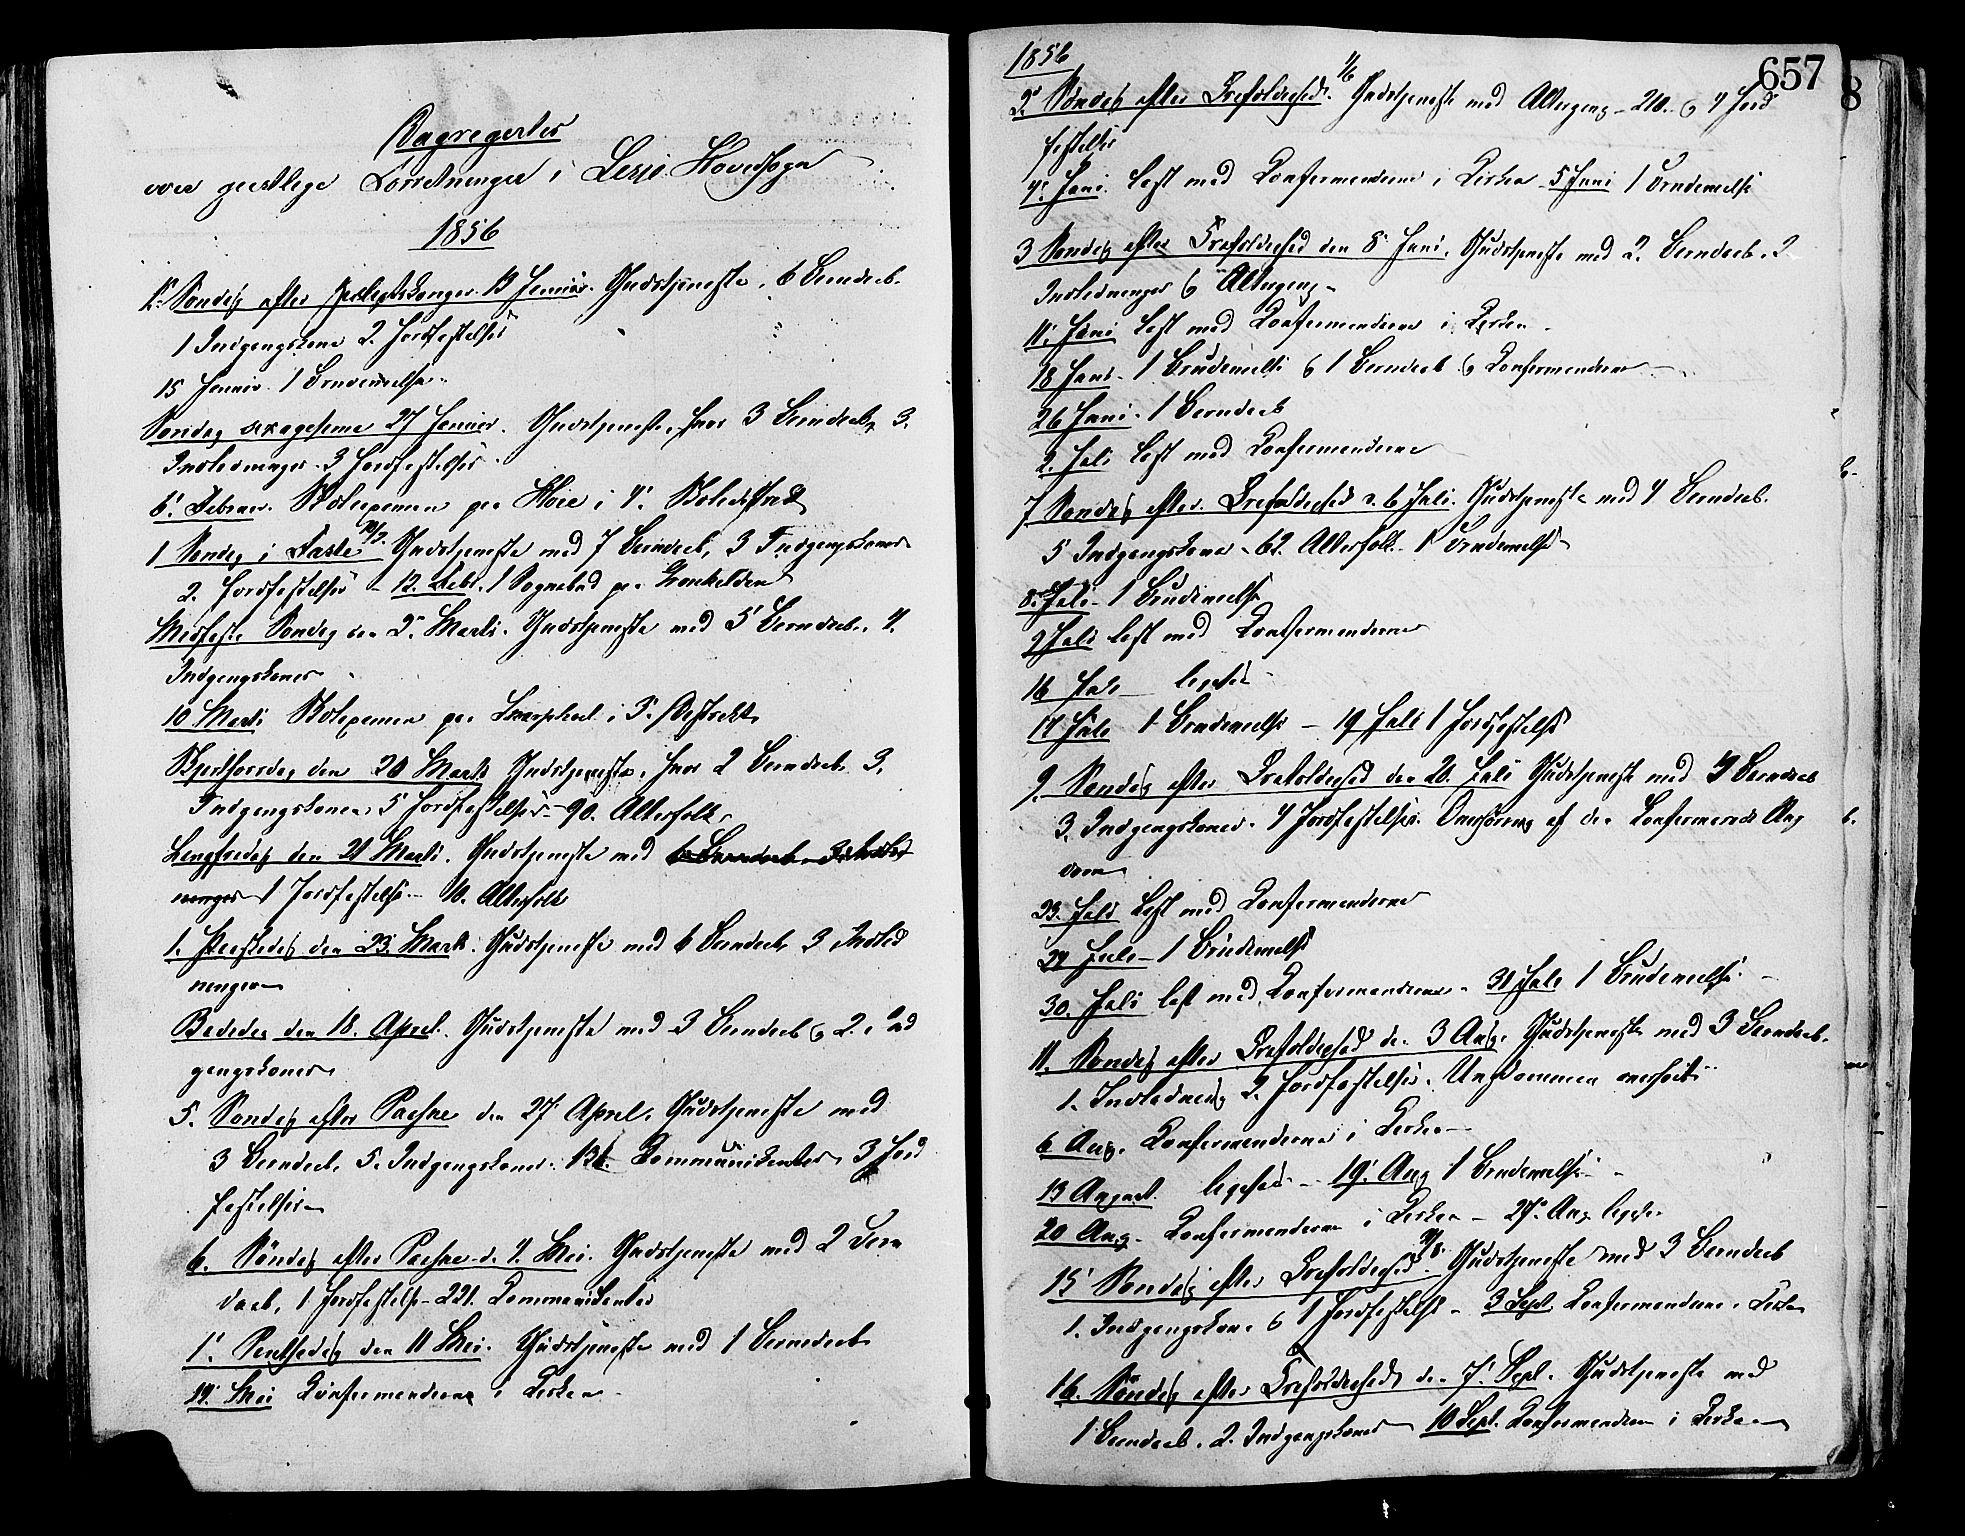 SAH, Lesja prestekontor, Ministerialbok nr. 8, 1854-1880, s. 657